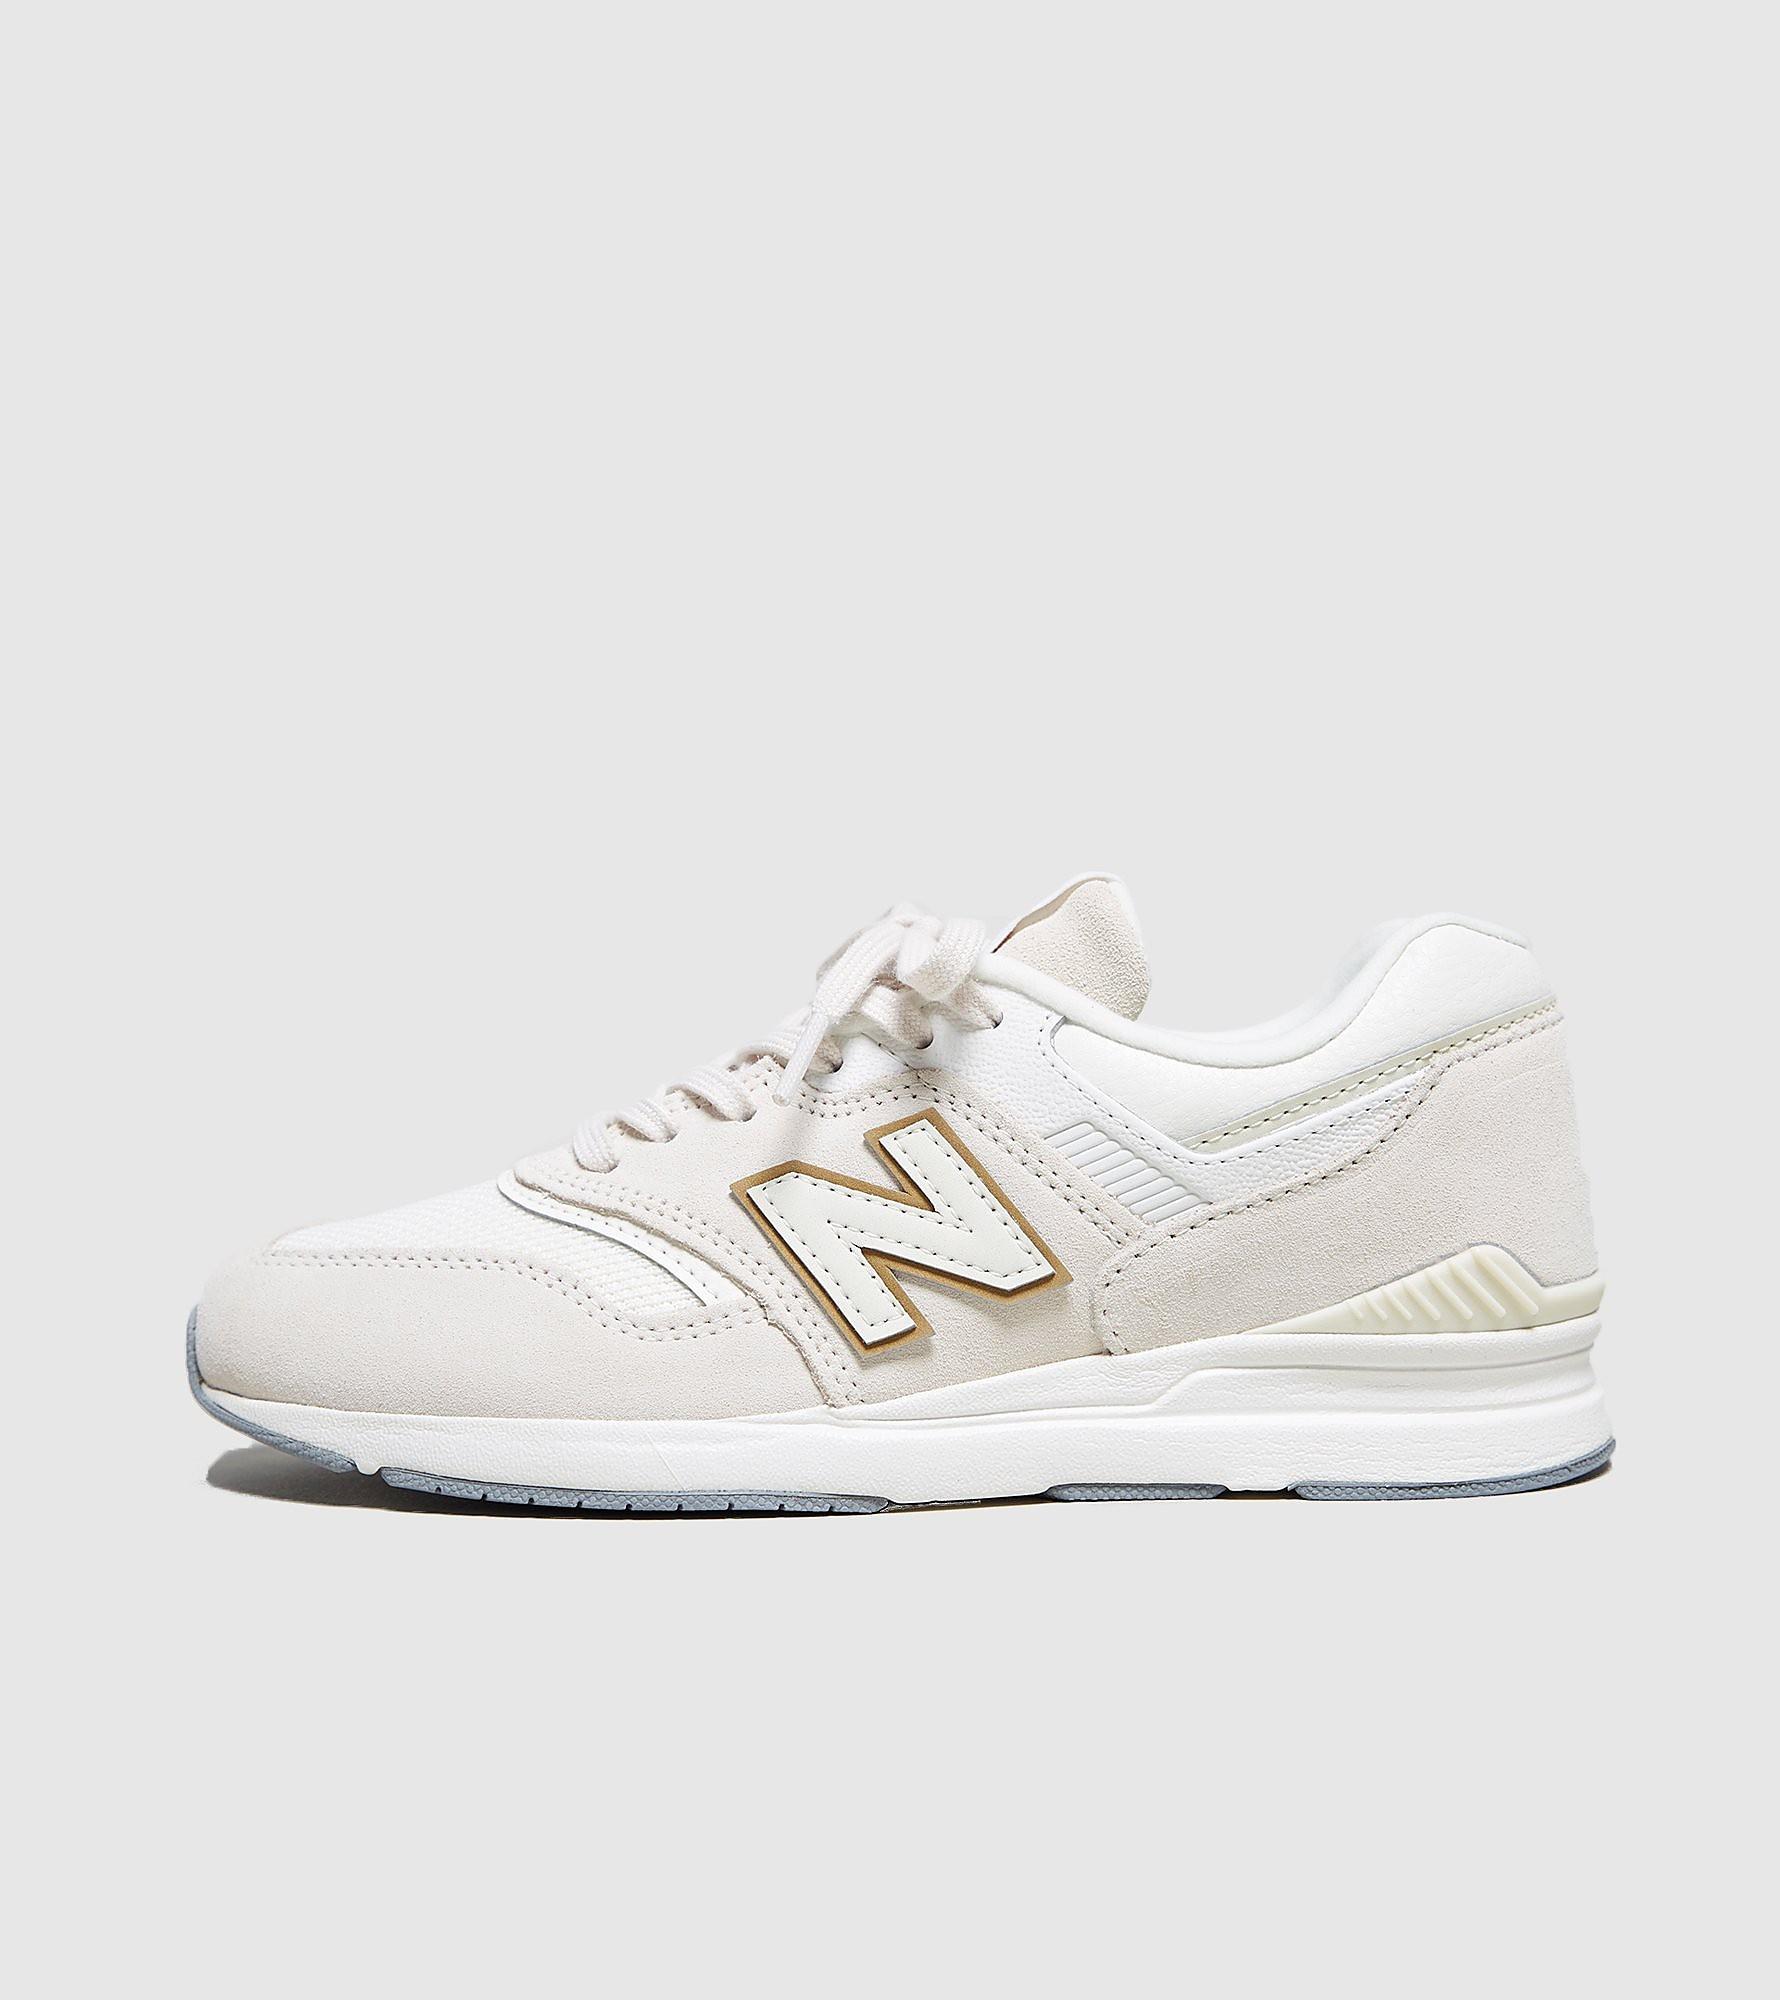 New Balance 697 Femme